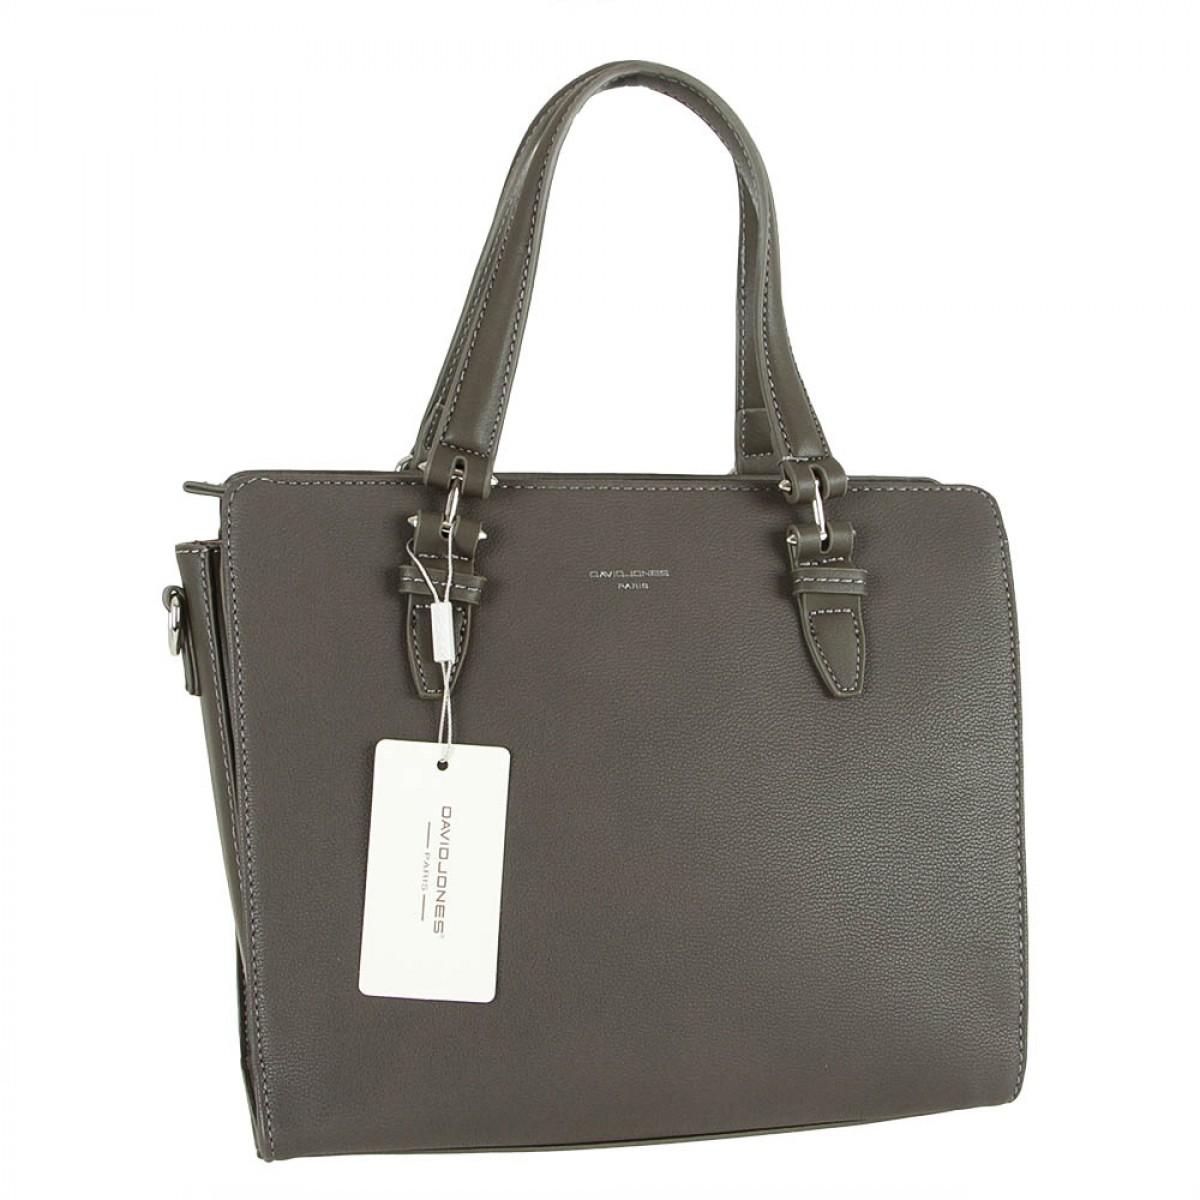 Жіноча сумка David Jones 5819-3 D.GREY